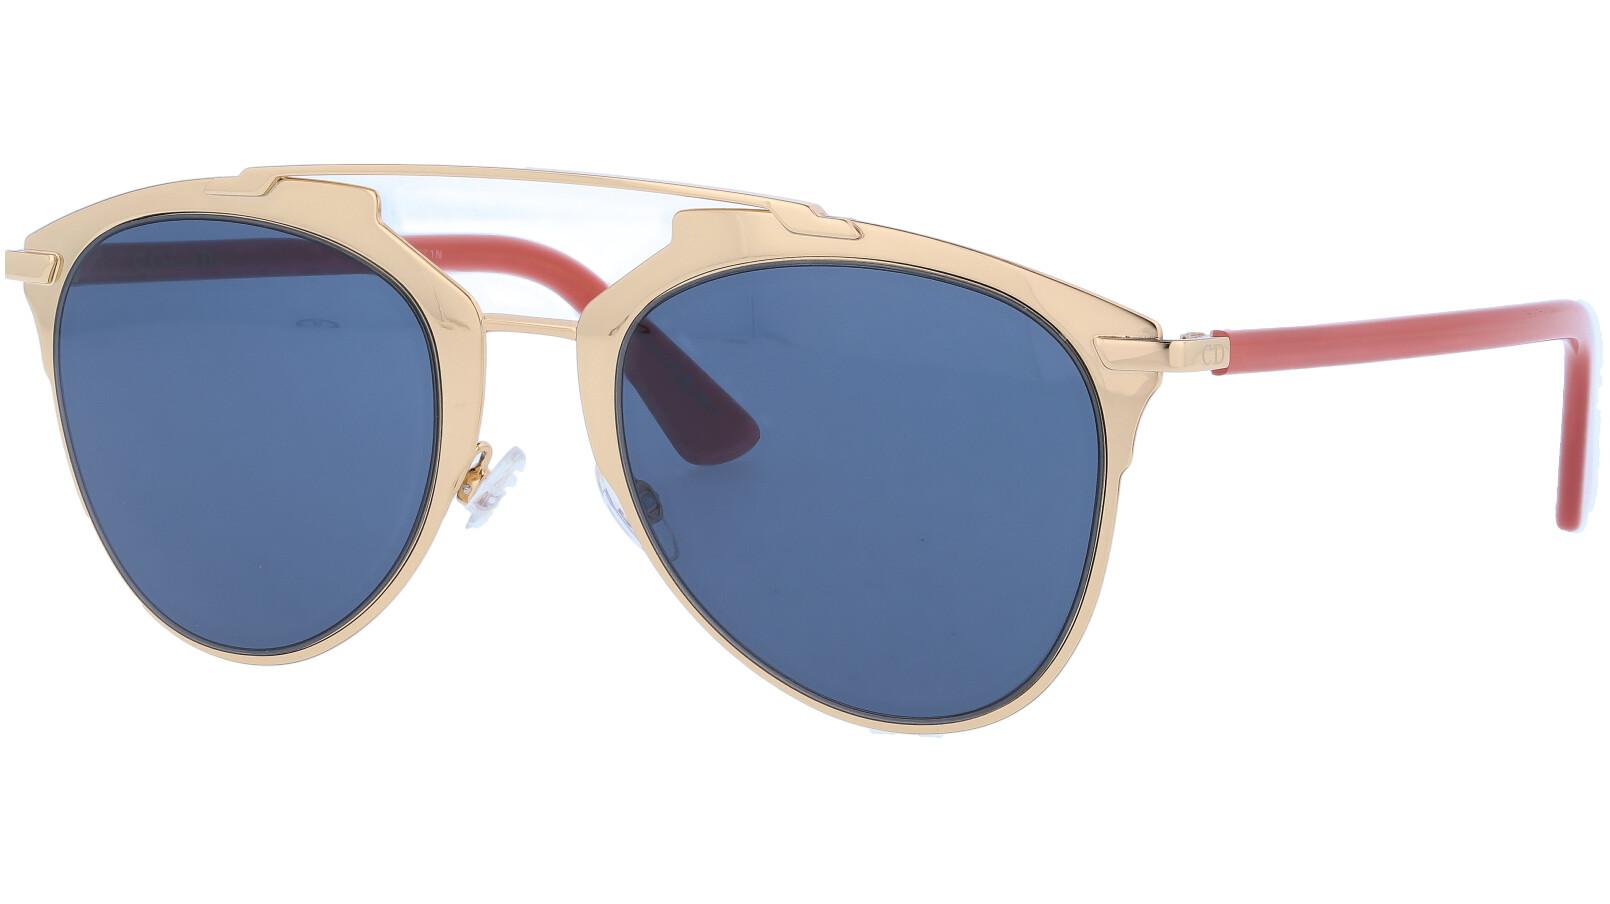 DIOR DIORREFLECTED 3210R 52 GDCPPR Sunglasses